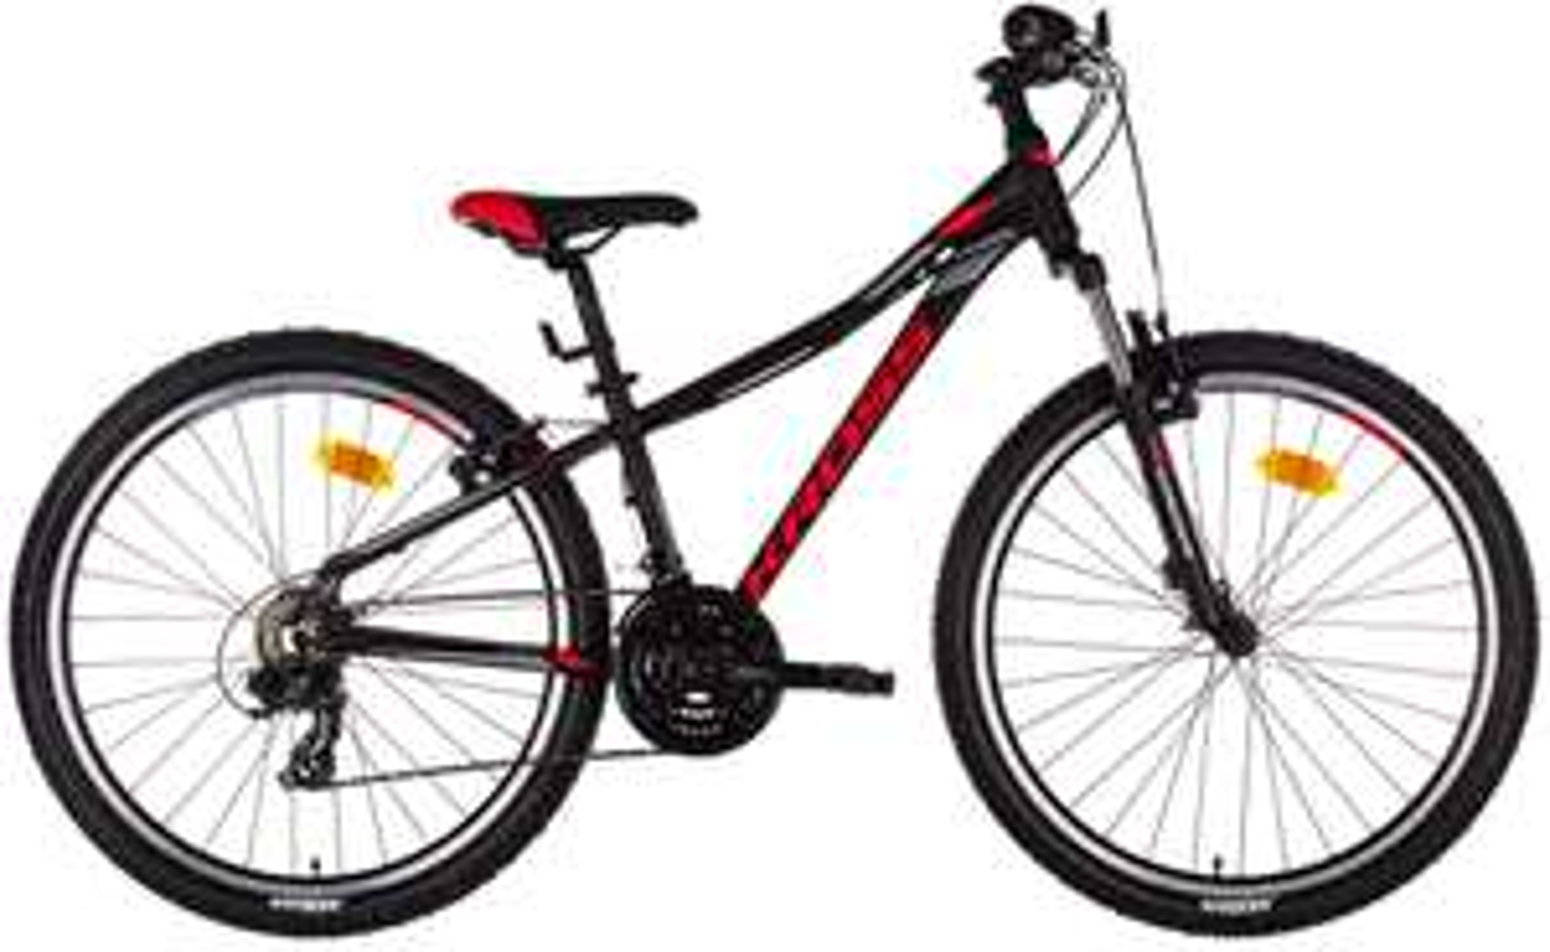 Damski rower górski Kross rozmiar M